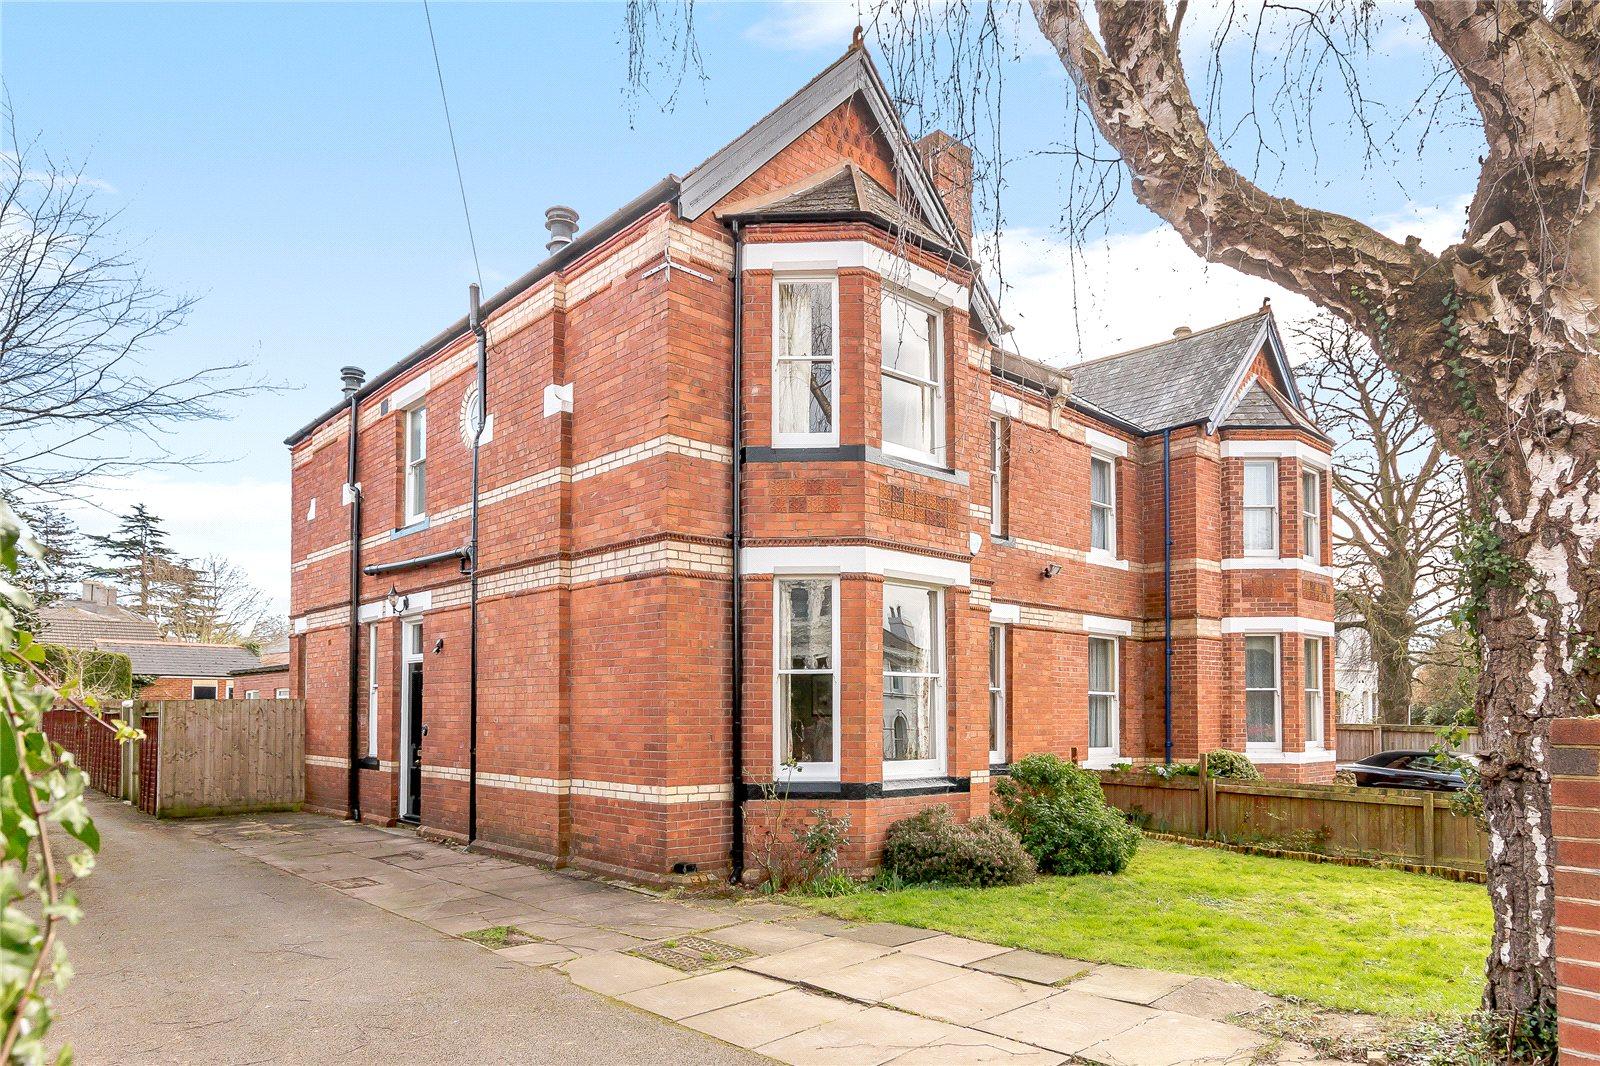 Tek Ailelik Ev için Satış at Lyndhurst Road, Exeter, Devon, EX2 Exeter, Ingiltere